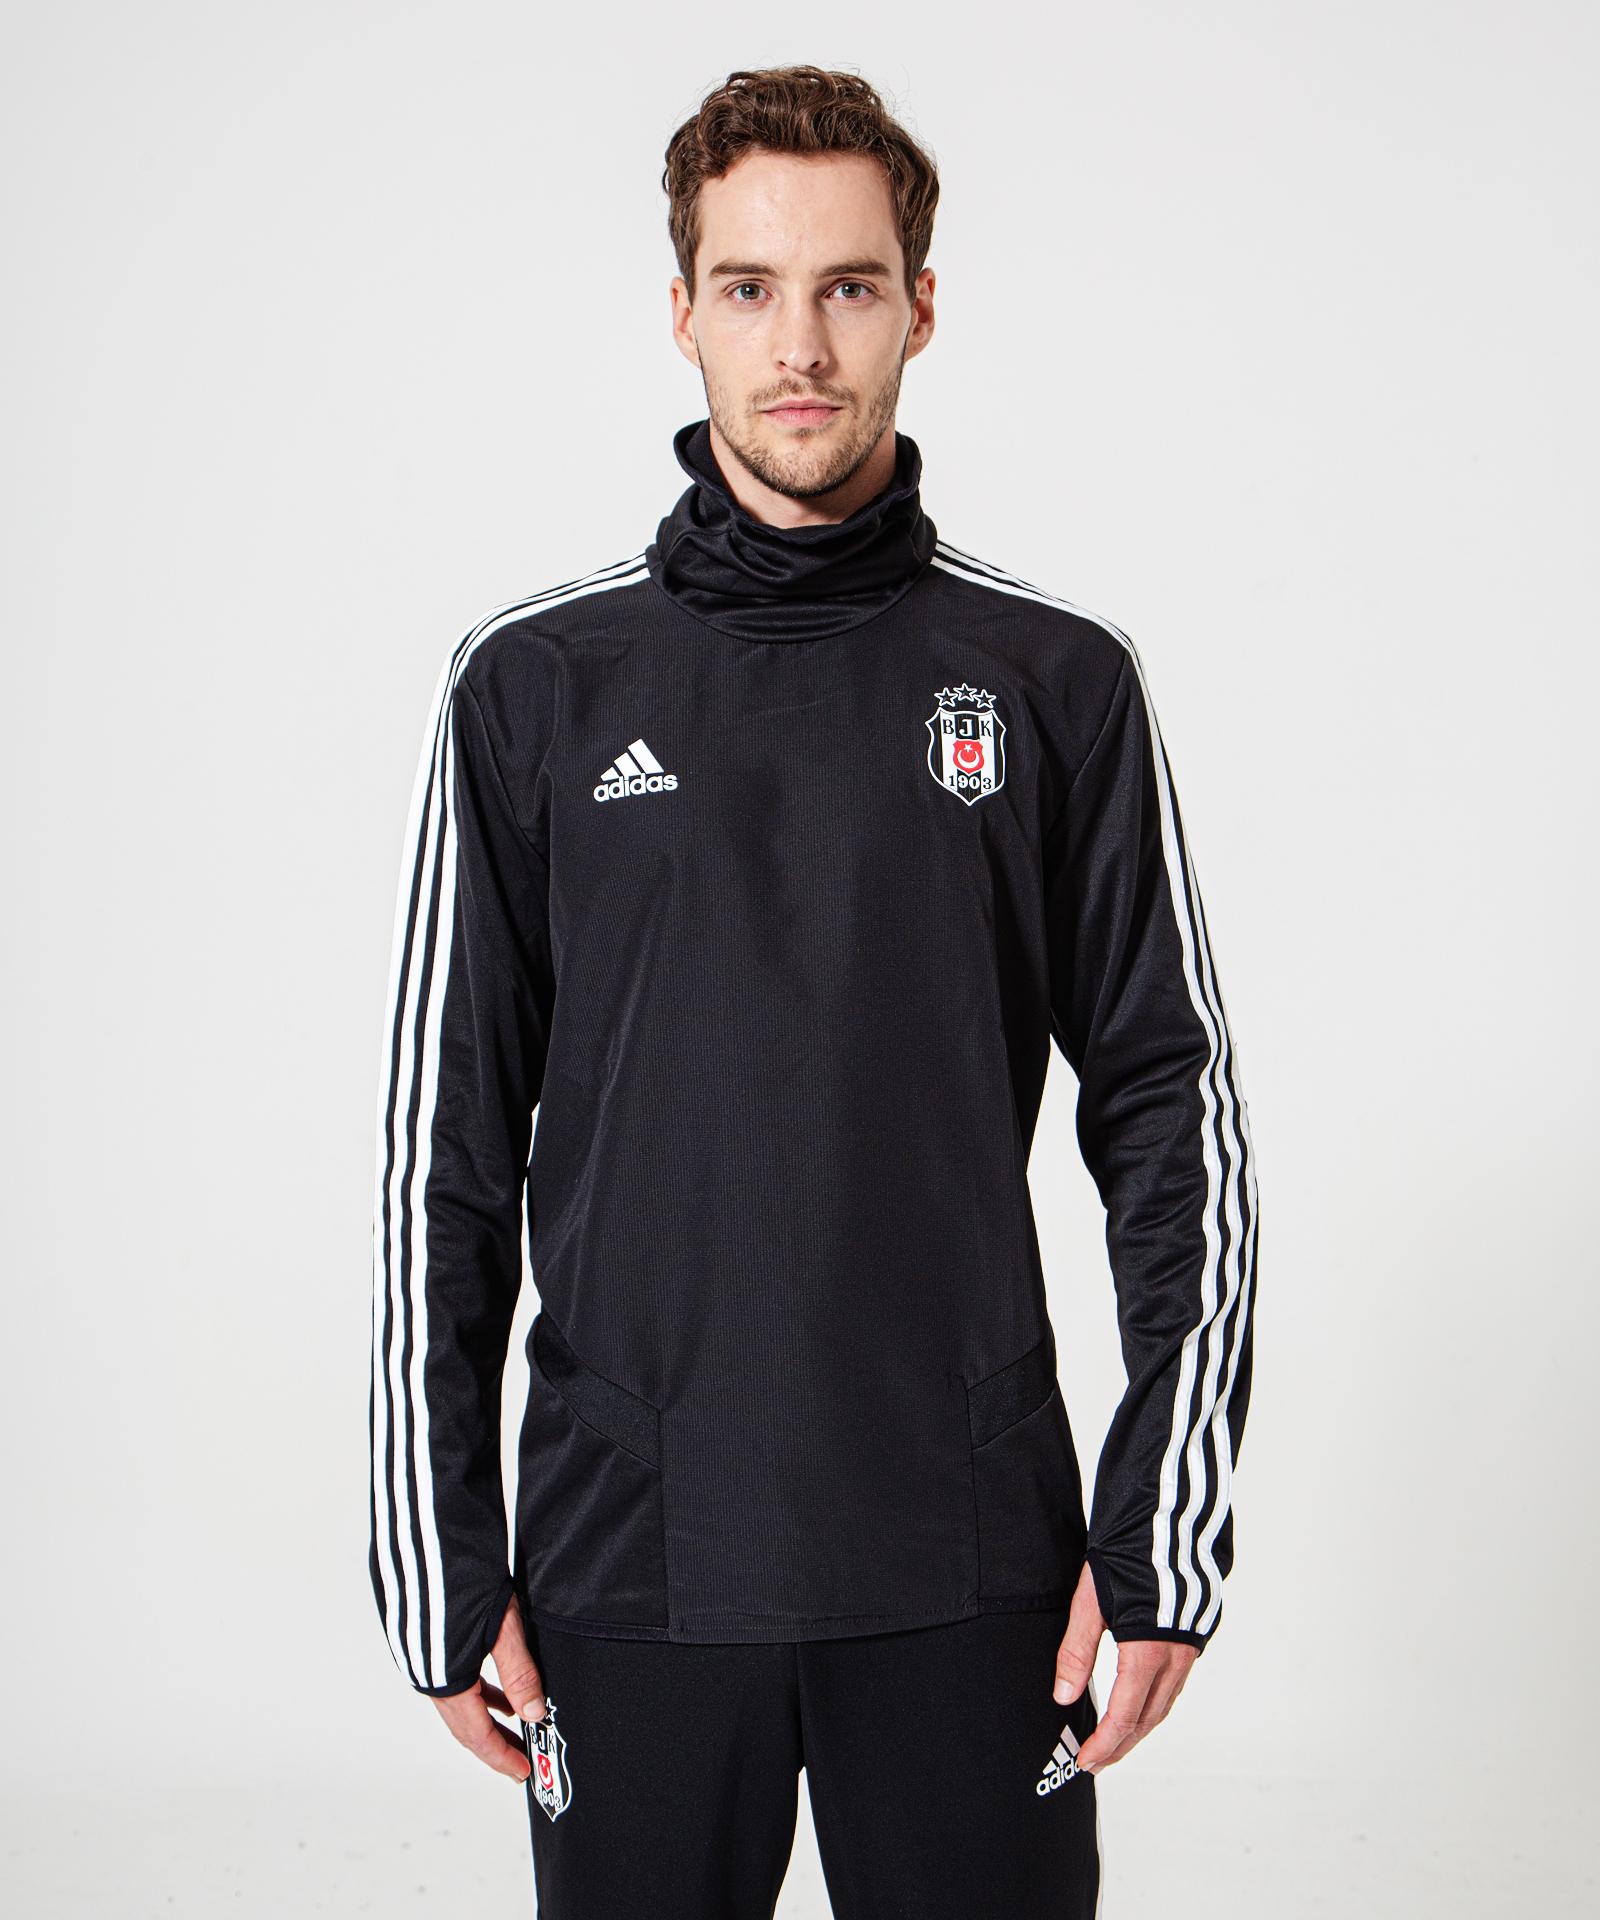 adidas Beşiktaş 2014 2015 Antrenman Erkek Sweatshirt